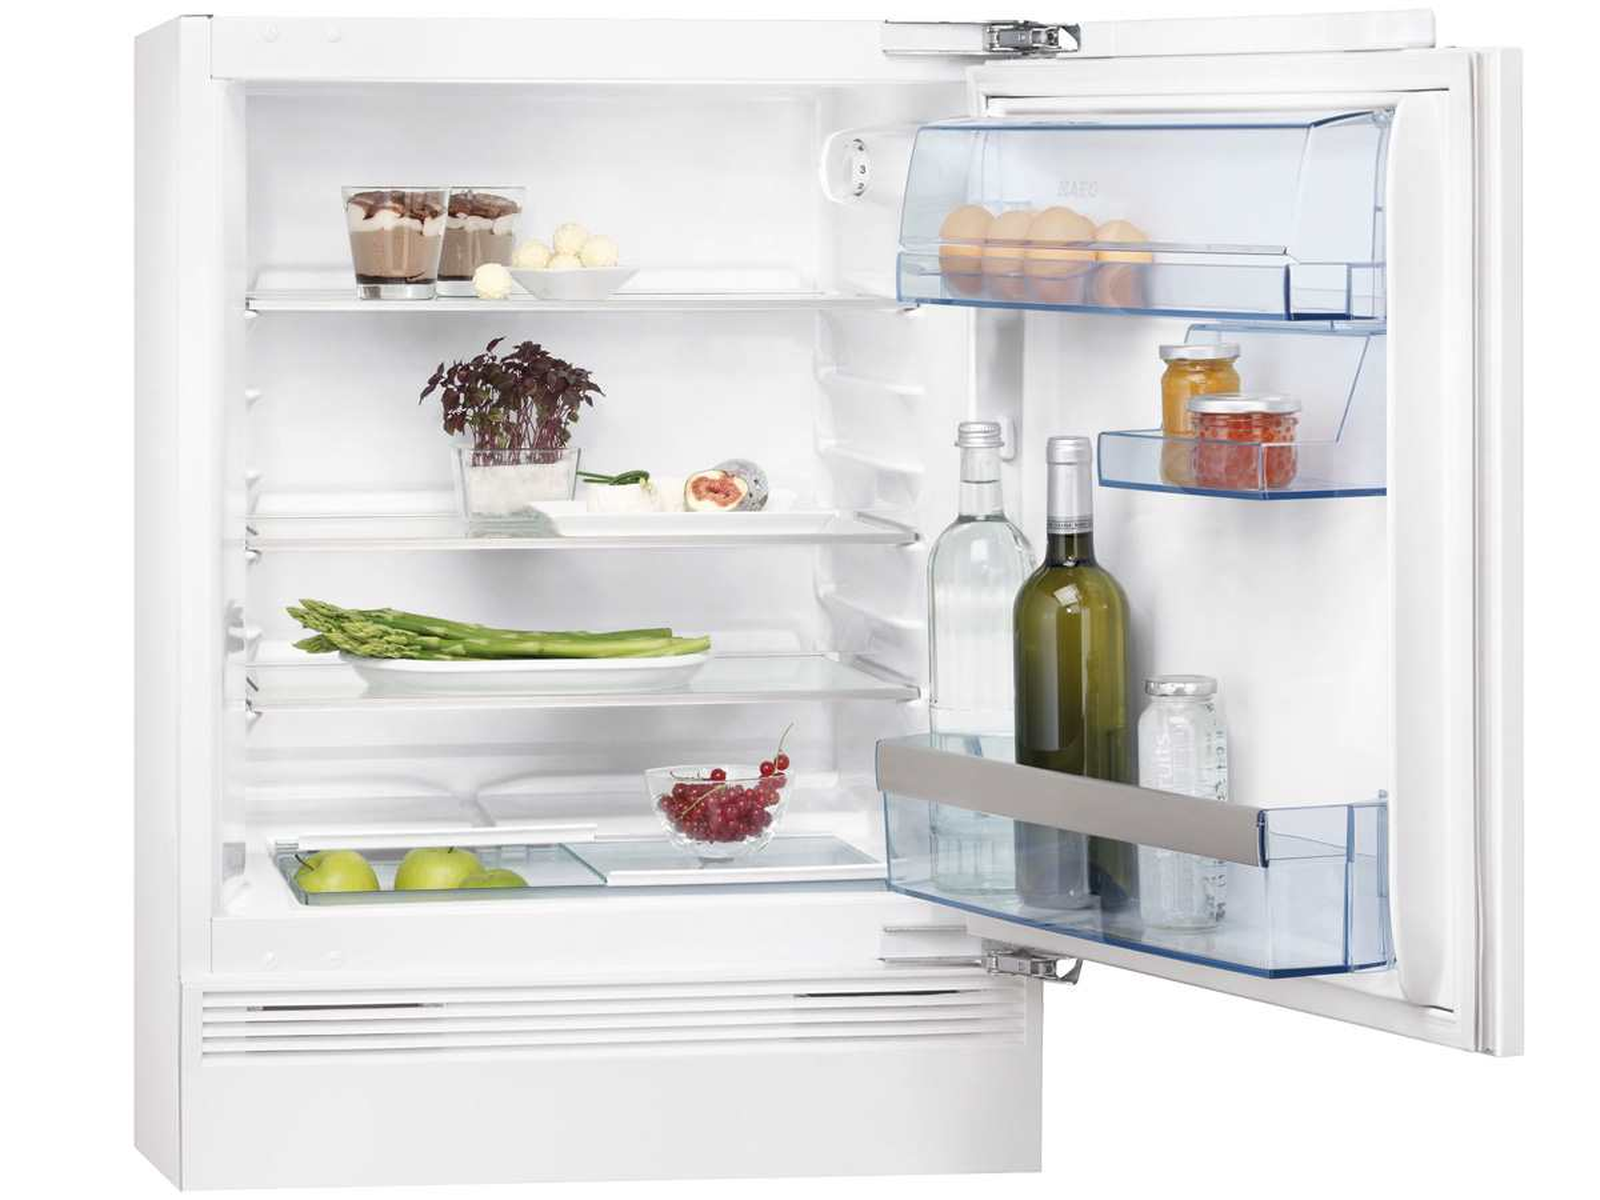 Aeg Kühlschrank Forum : Kühlschrank unterbau aeg sks58200f0 unterbau kühlschrank festtür 82 cm